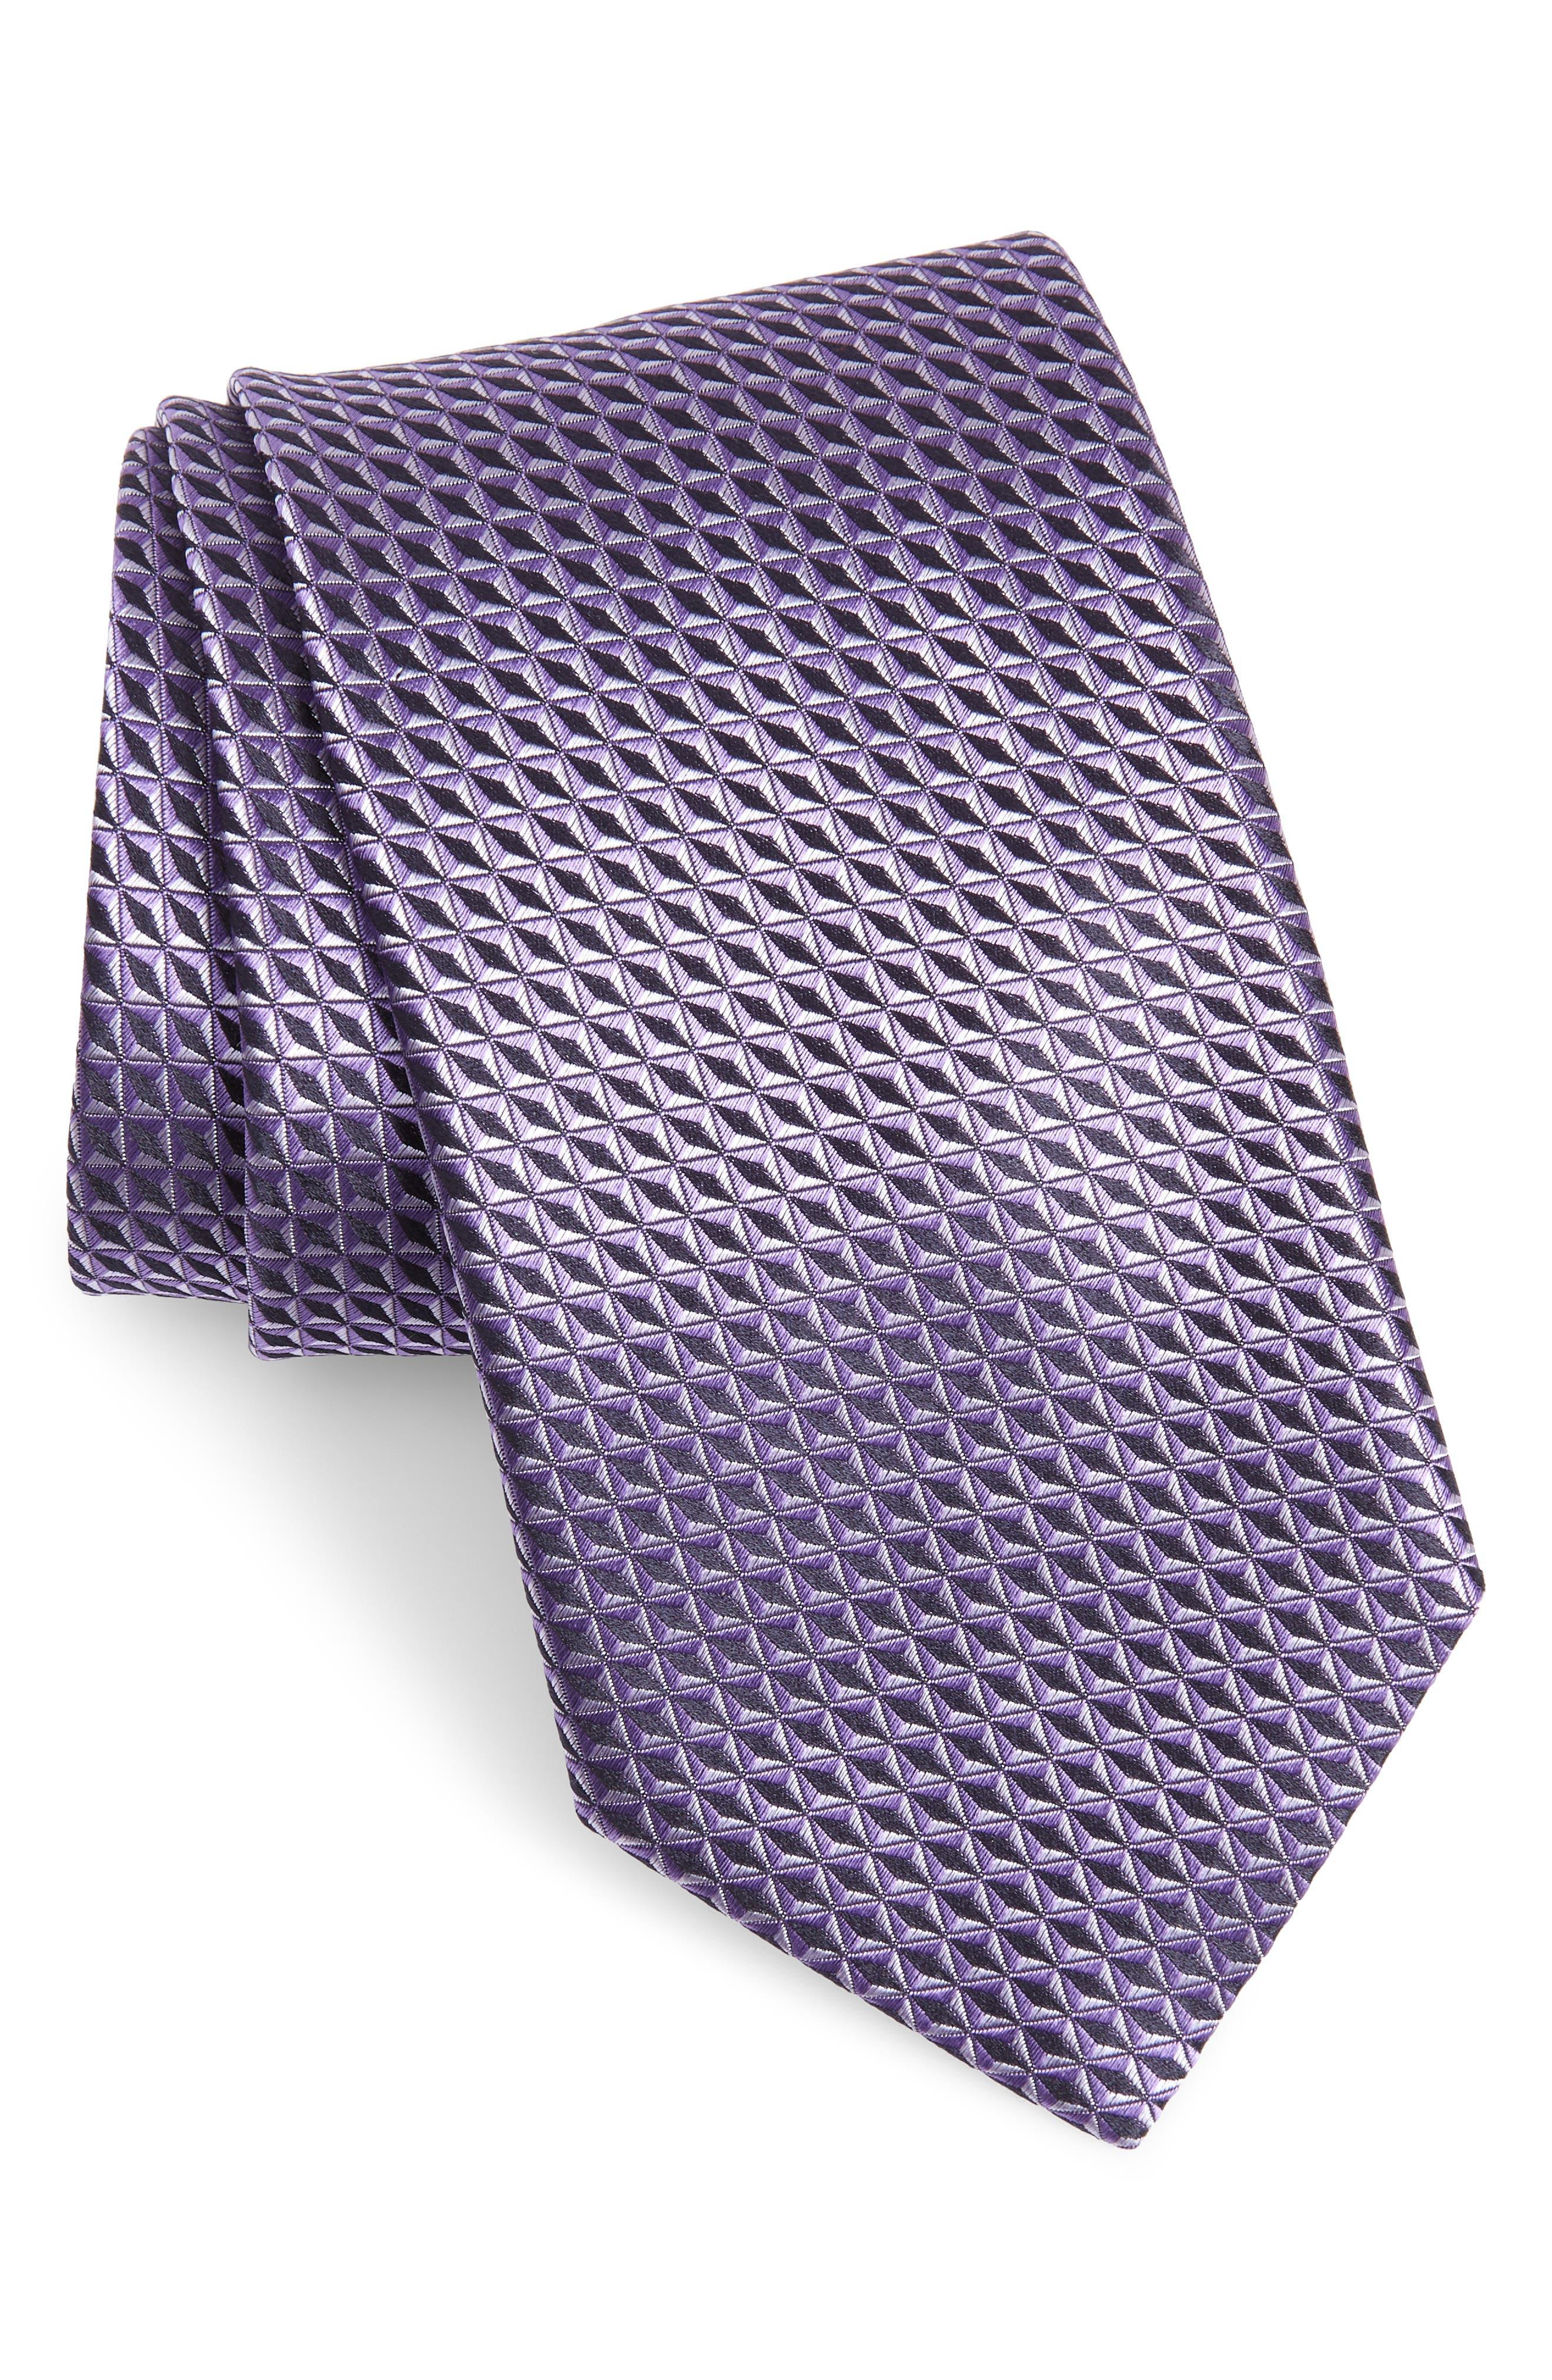 CANALI Geometric Silk X-Long Tie, Main, color, LIGHT PURPLE